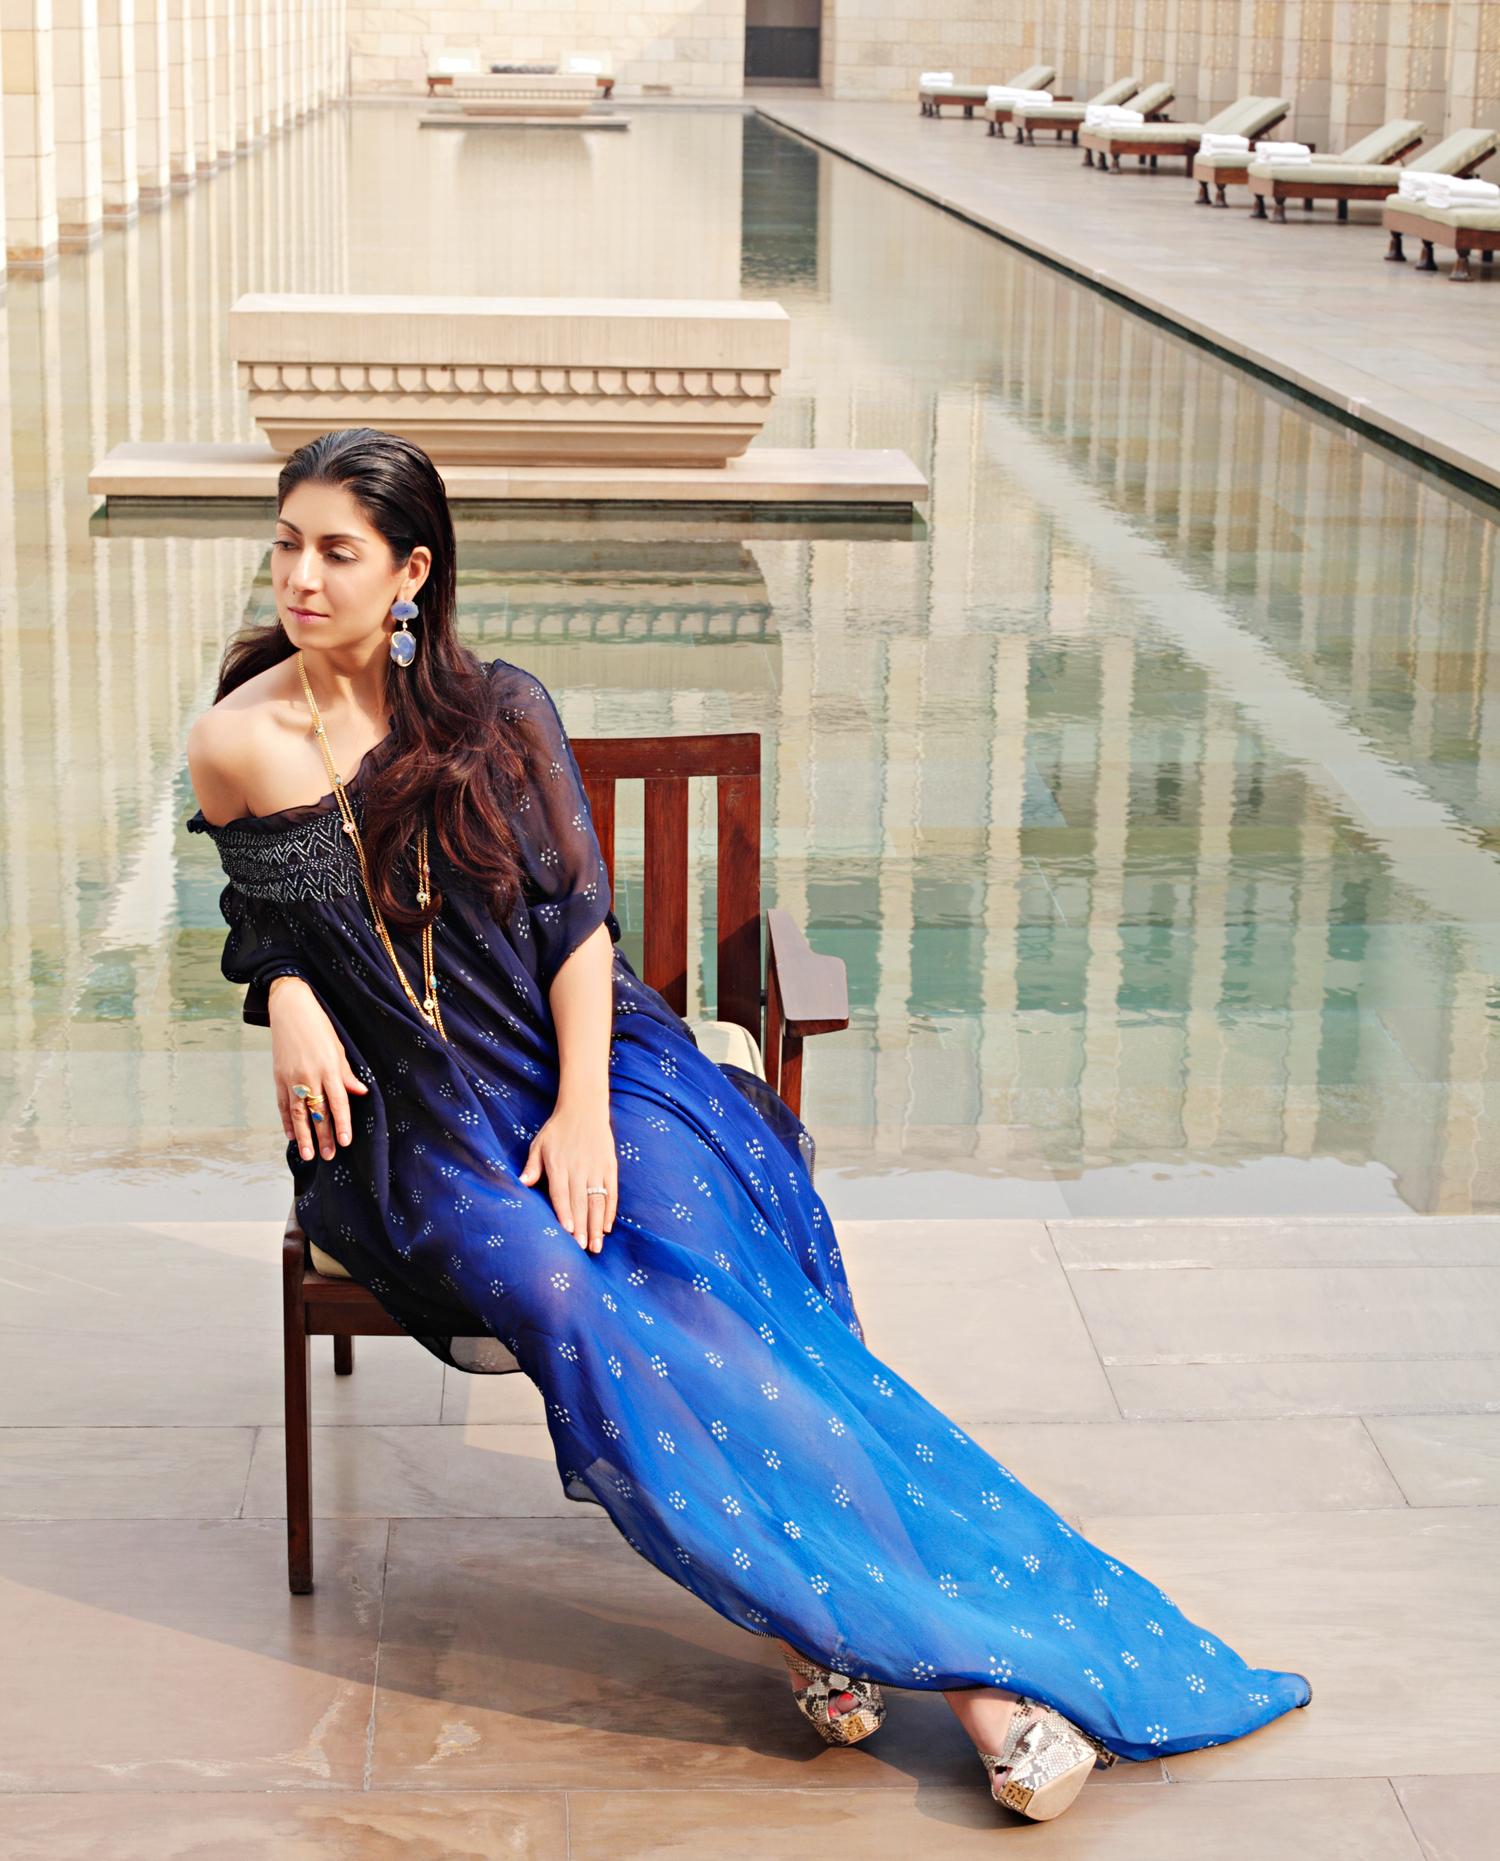 Anupi Oberoi, society wedding planner   Harper's Bazaar India